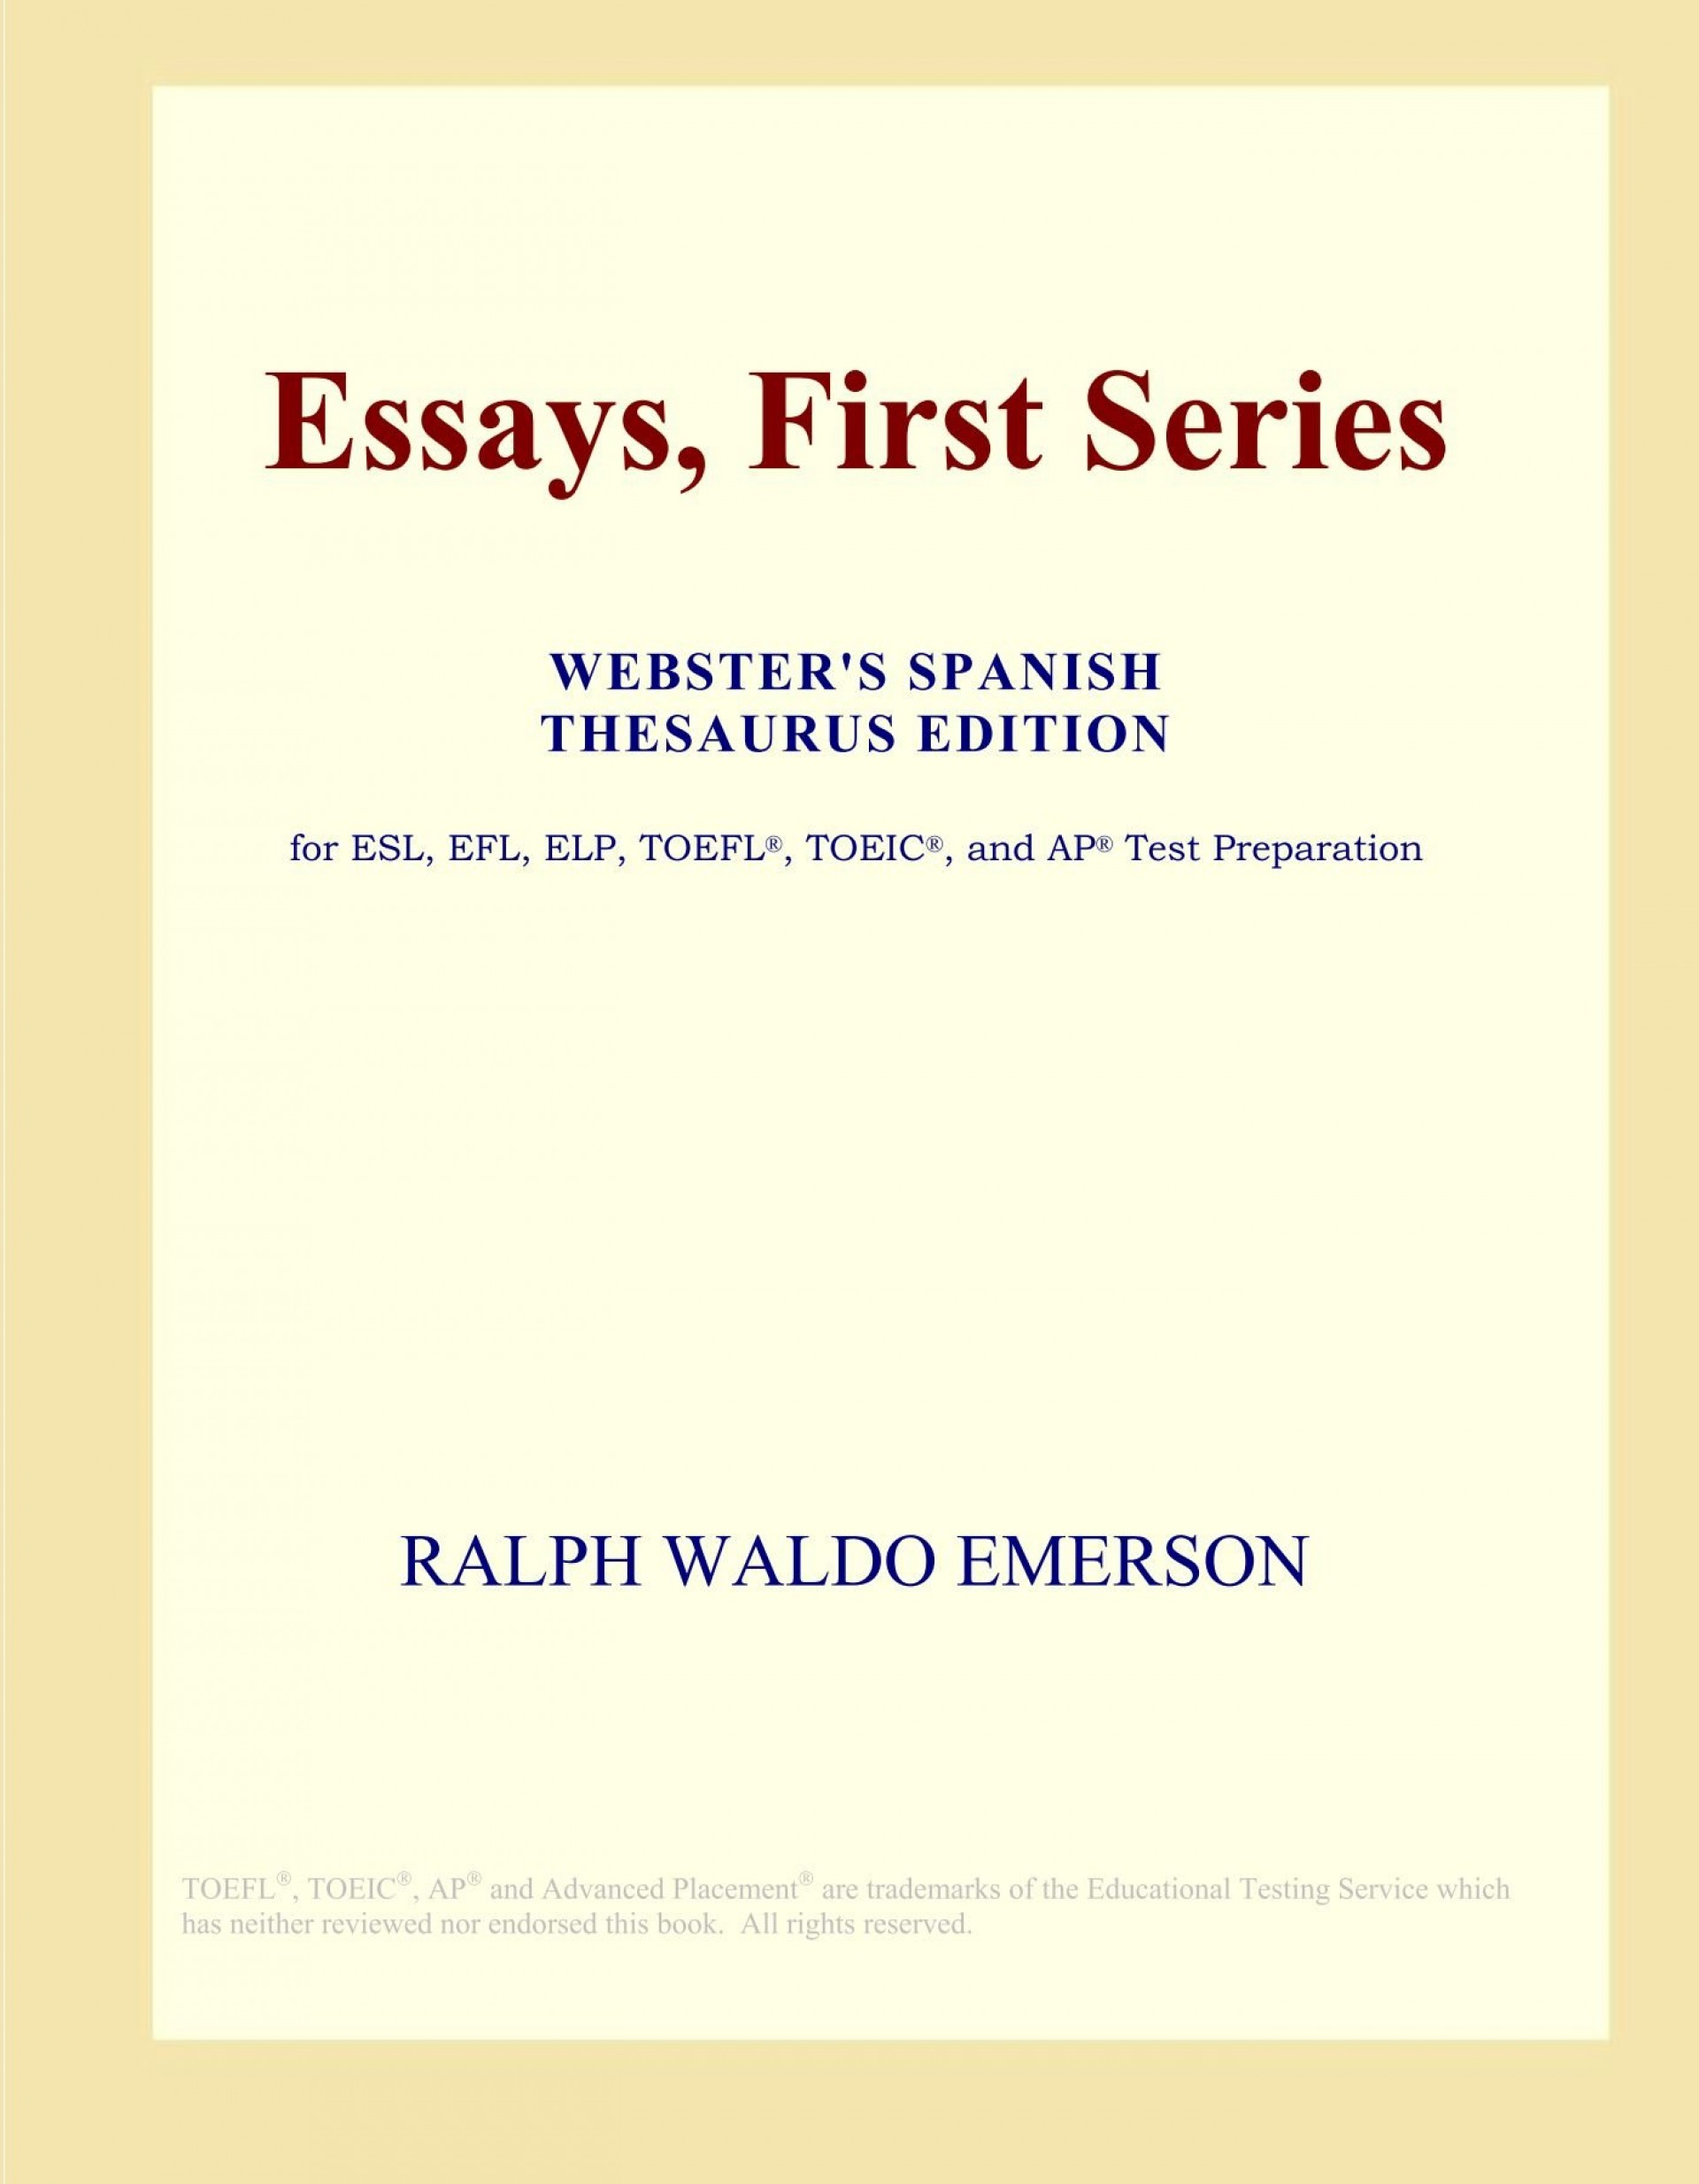 024 Essay Example 61cjxhnthzl Essays First Stunning Series Emerson Pdf Shelburne Publisher 1920